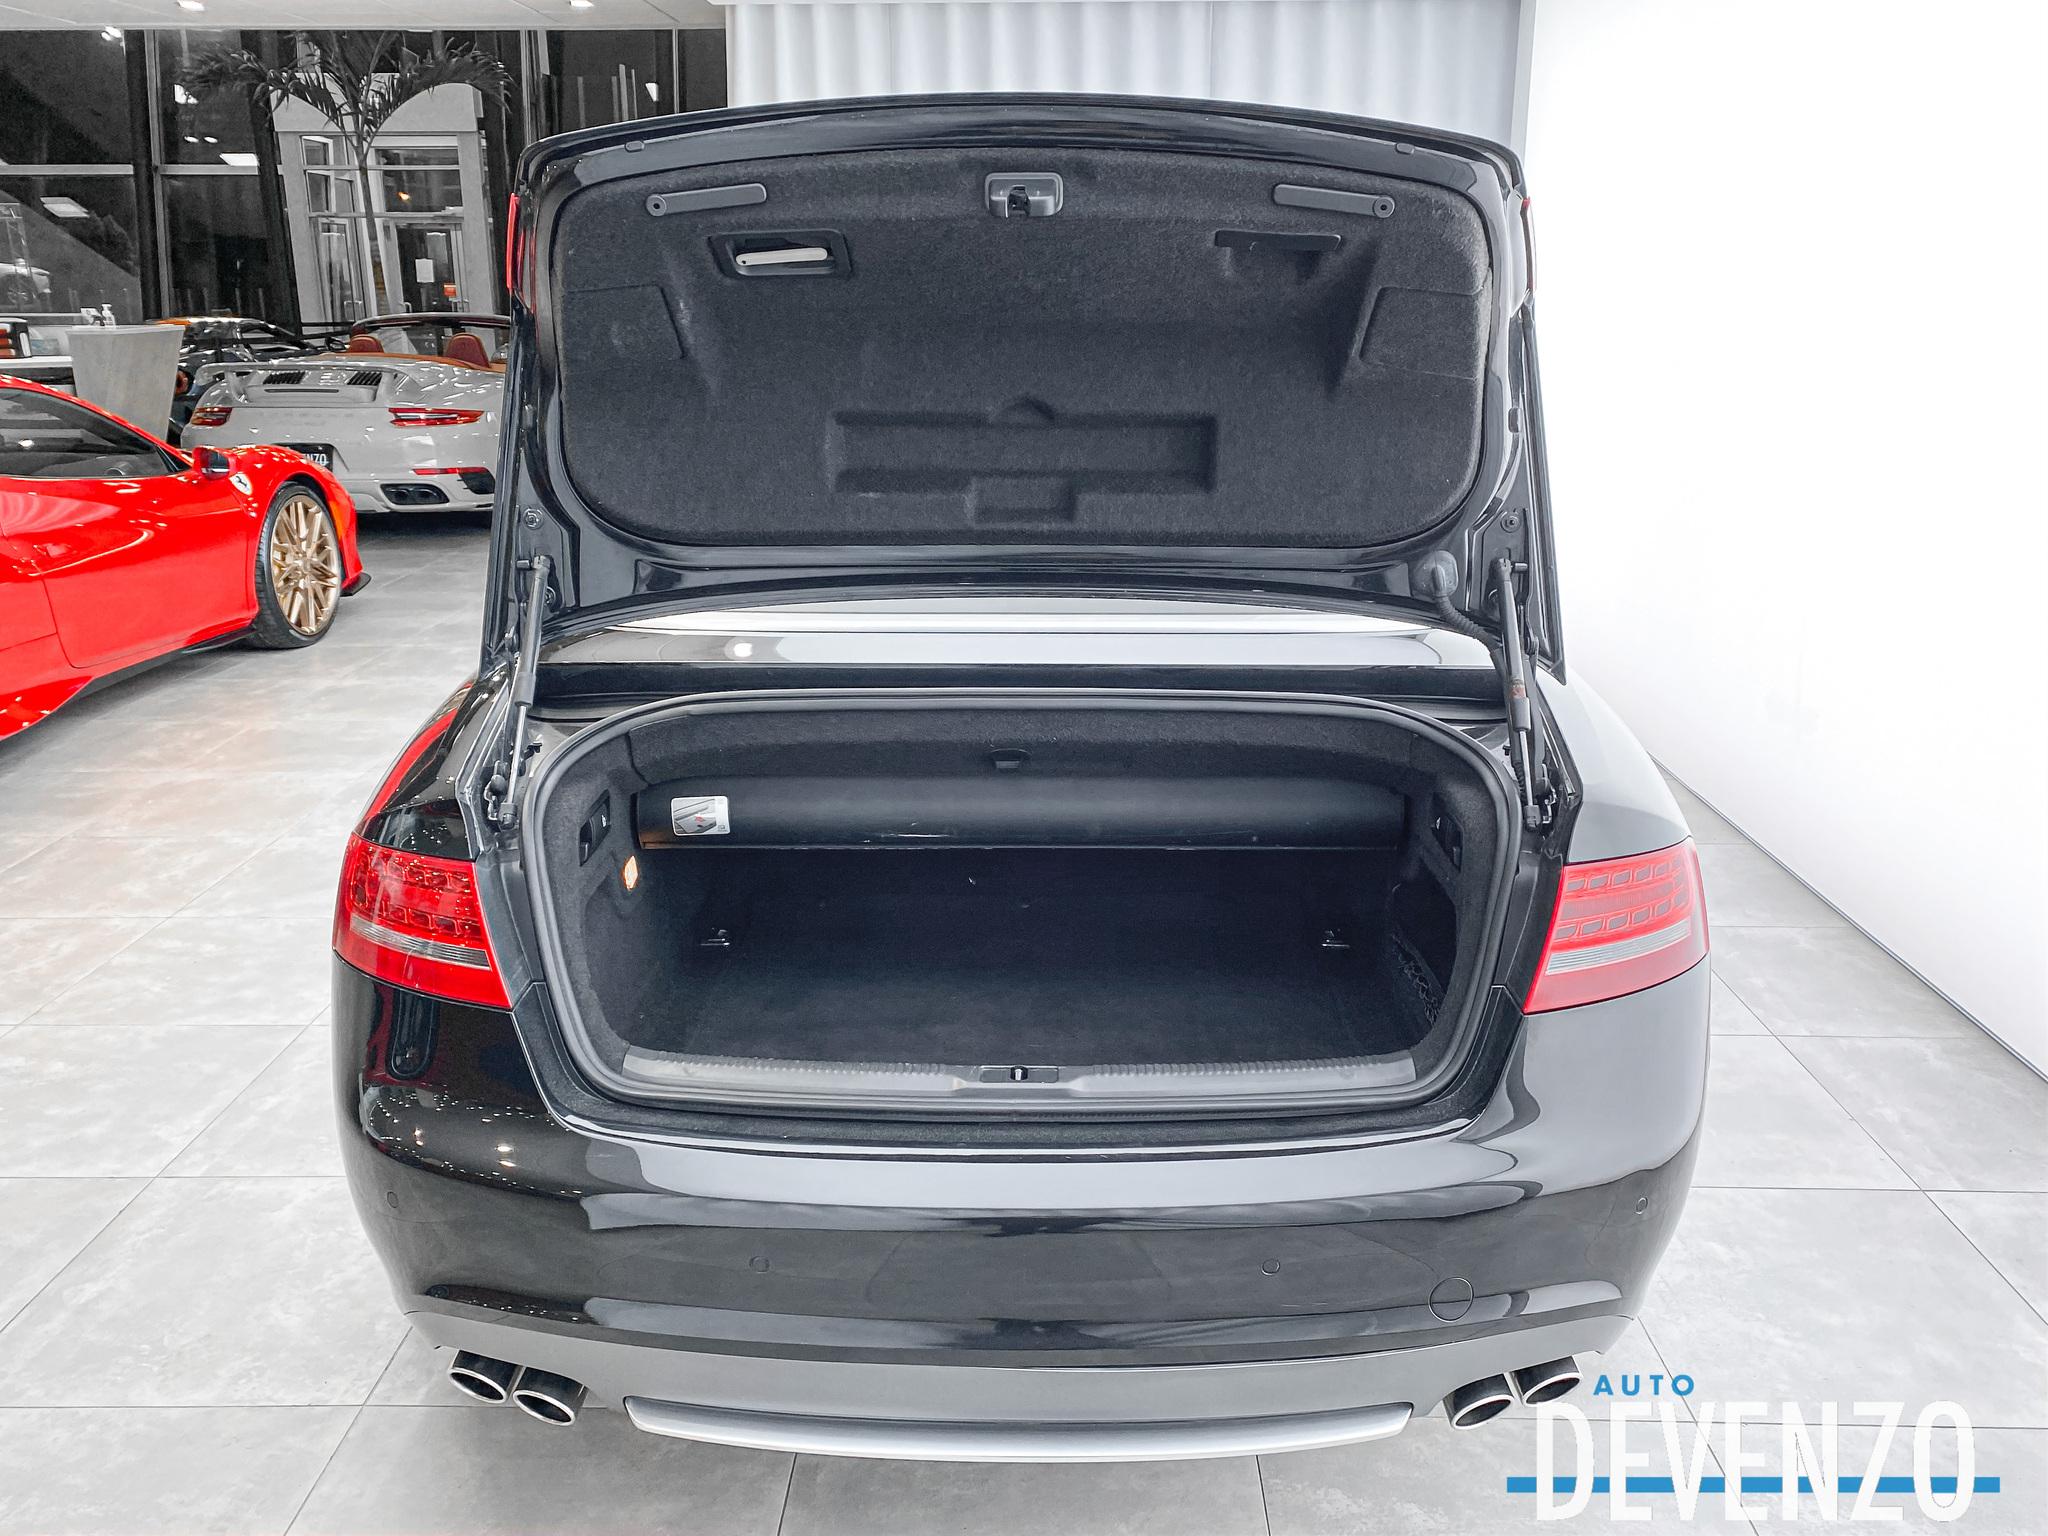 2011 Audi S5 Cabriolet S5 333HP Cabriolet QUATTRO NAVI B&O complet